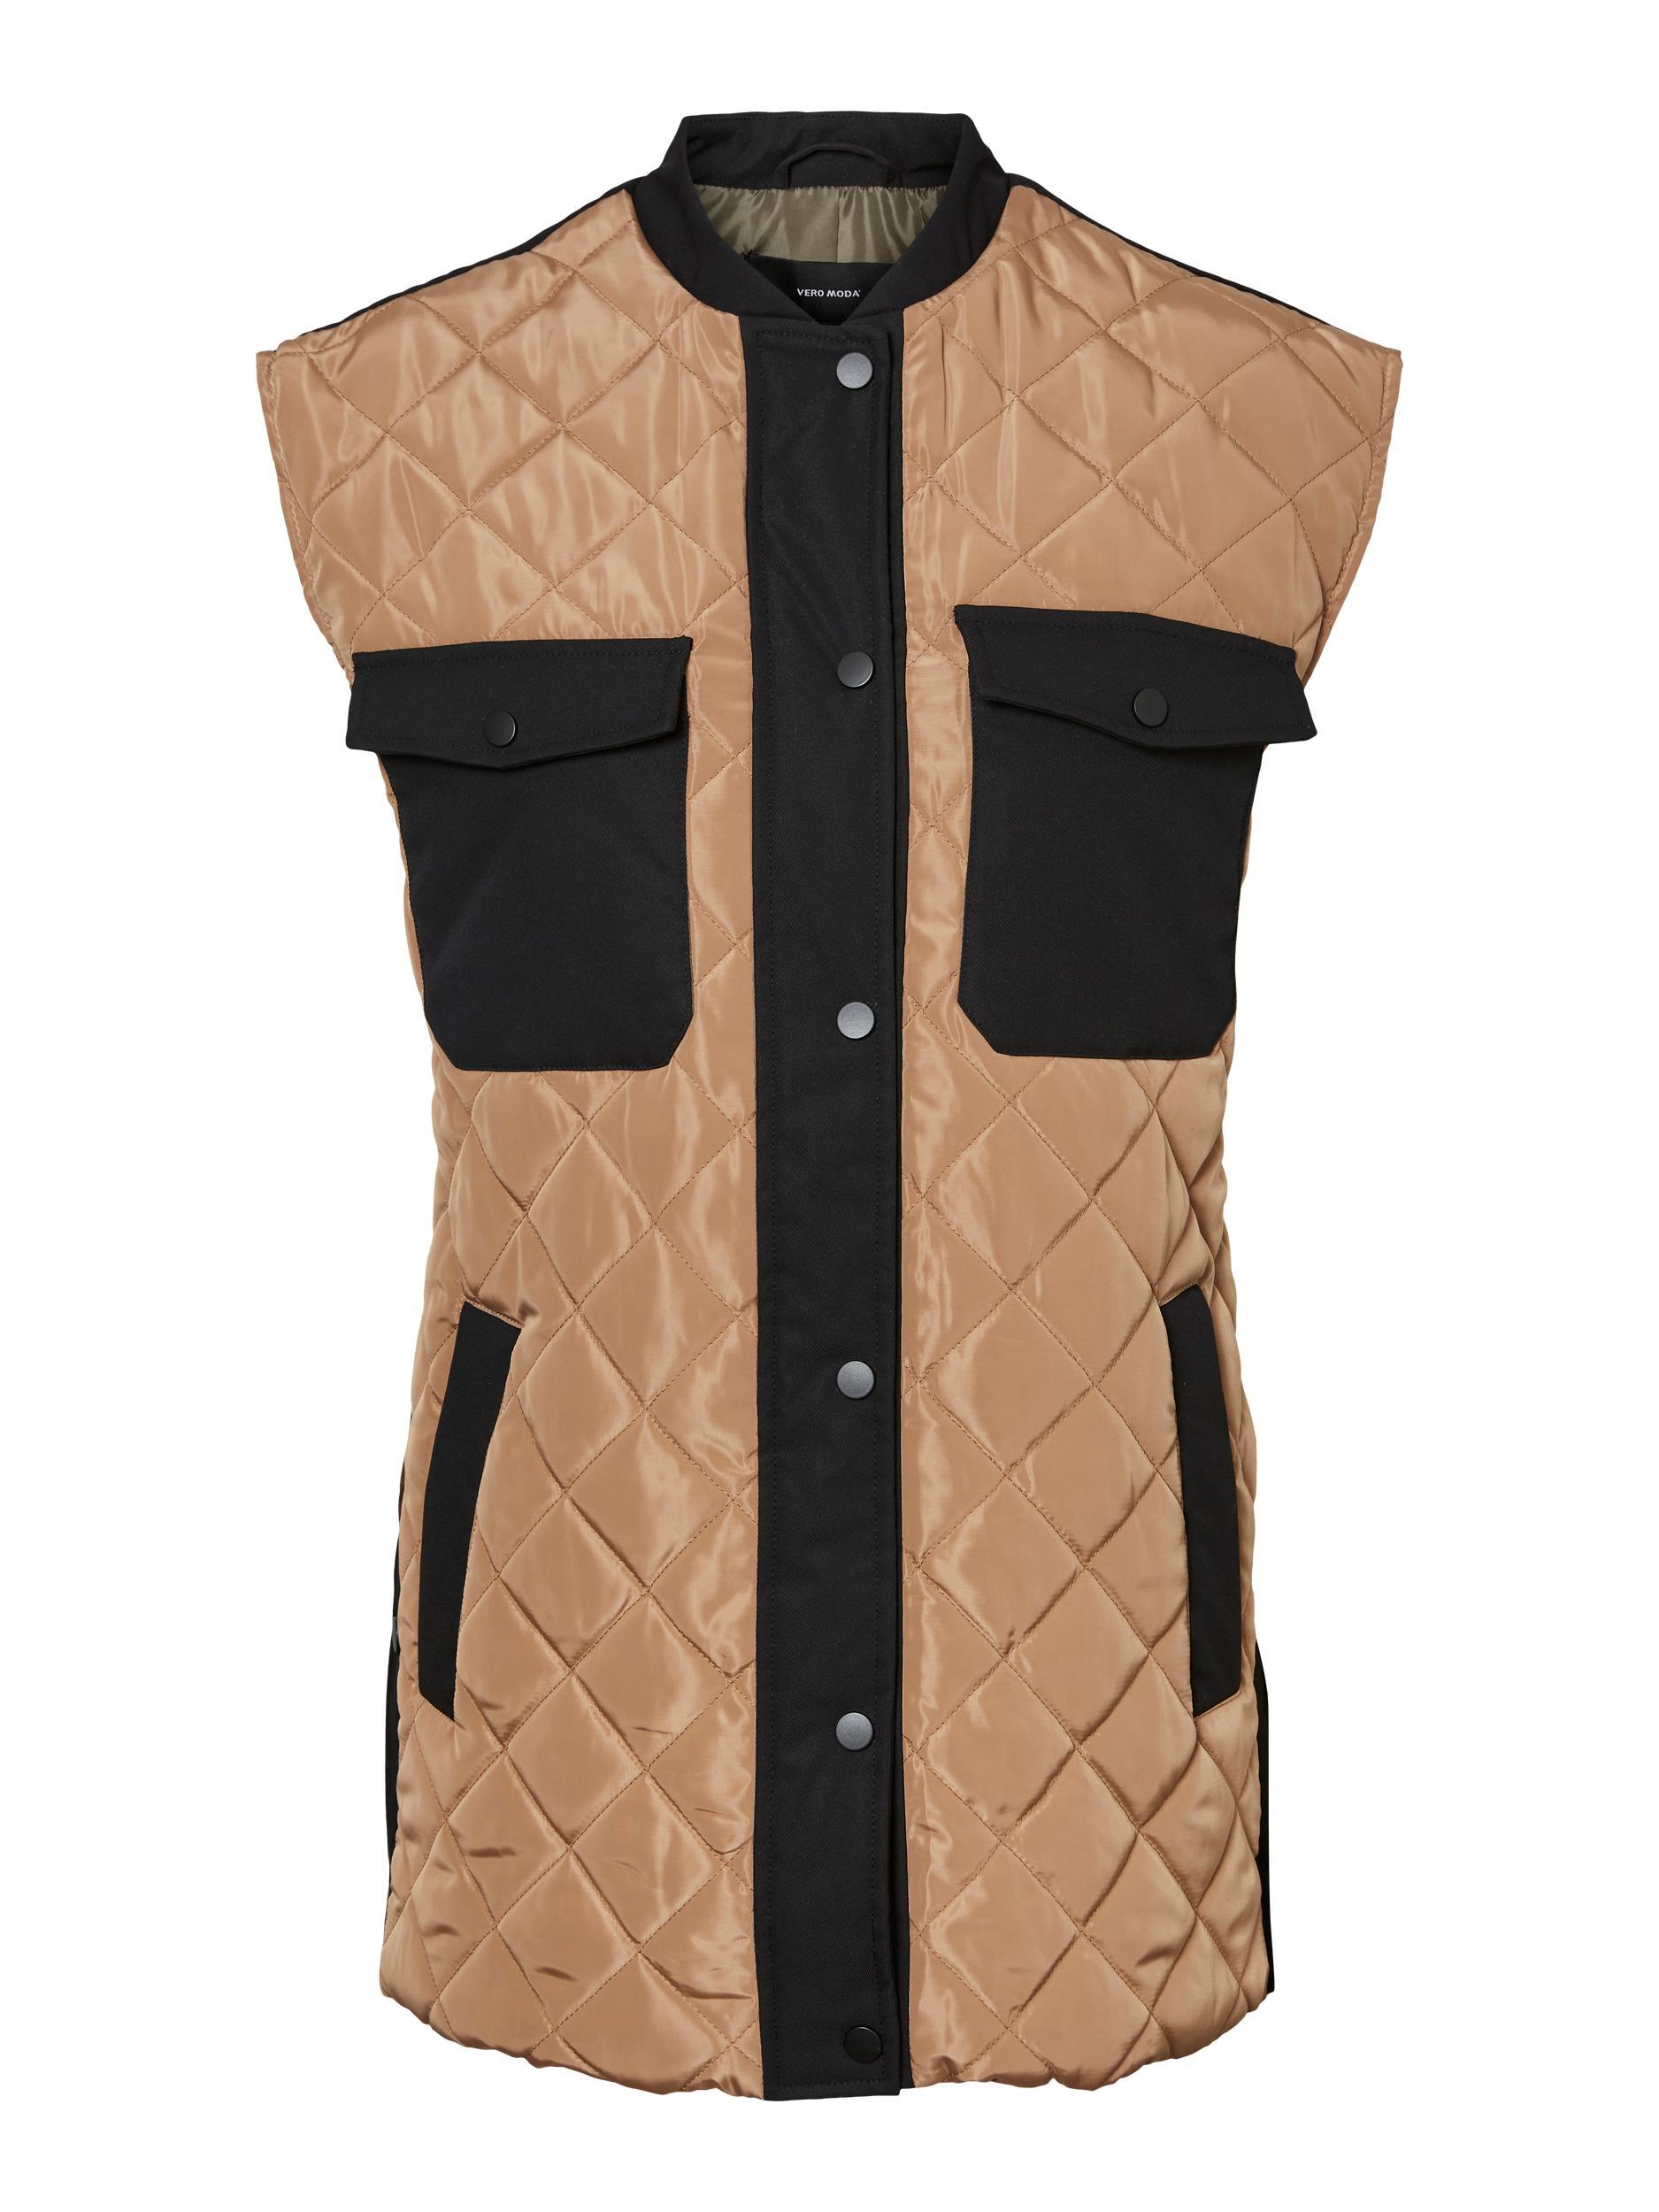 Vero Moda Morgan vest, tigers eye, x-large